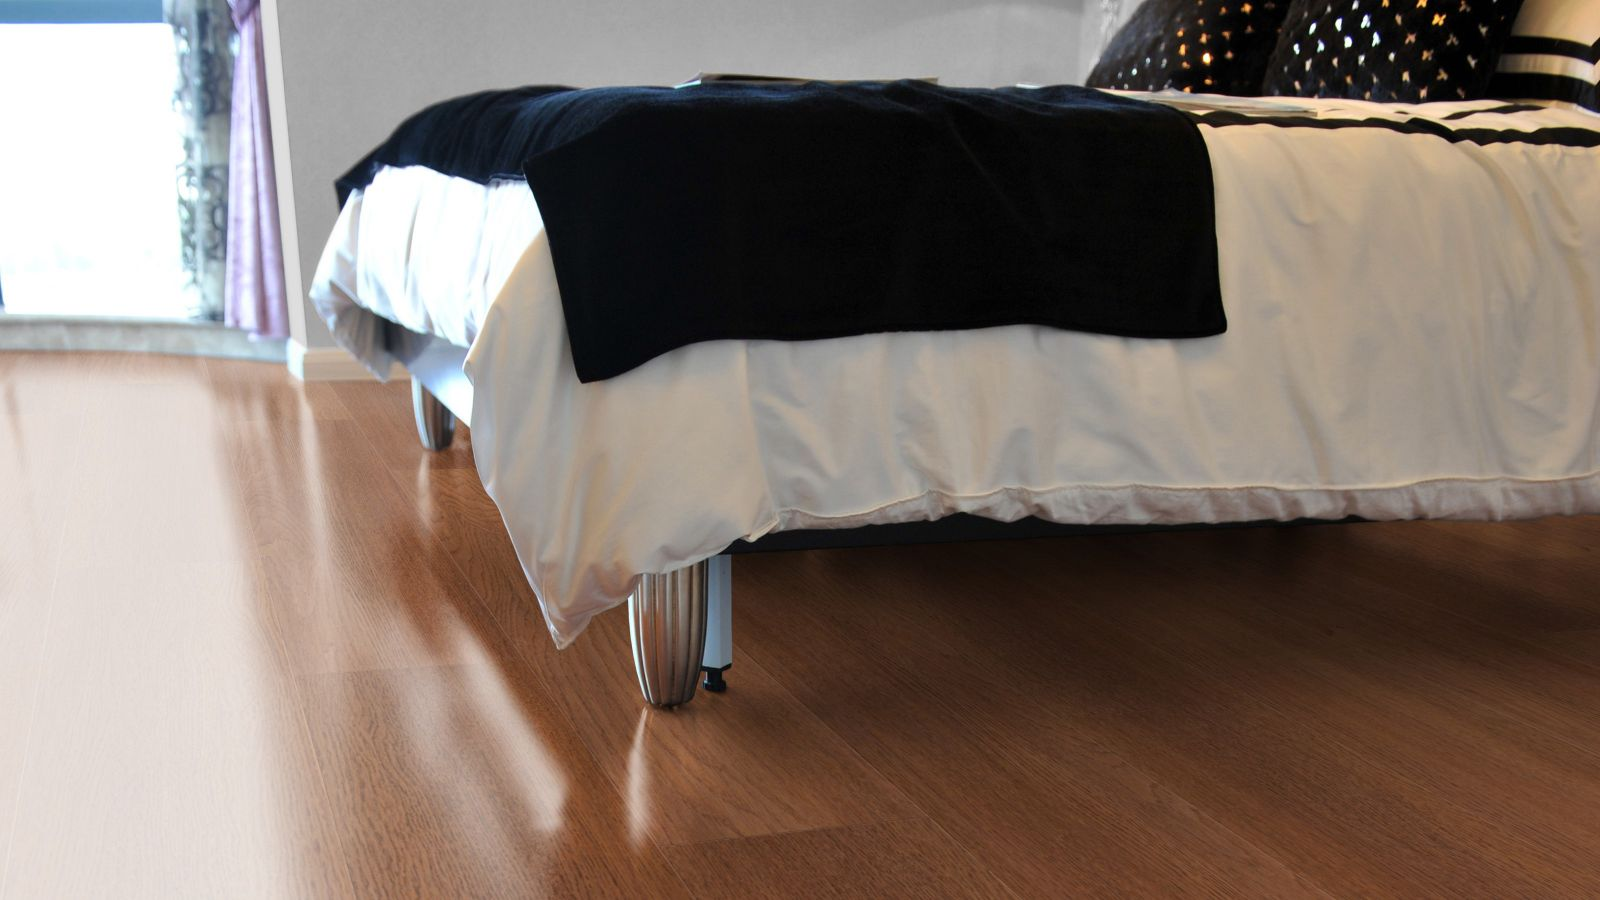 Vloer Slaapkamer Vloerverwarming : Alternatief linoleum vloer